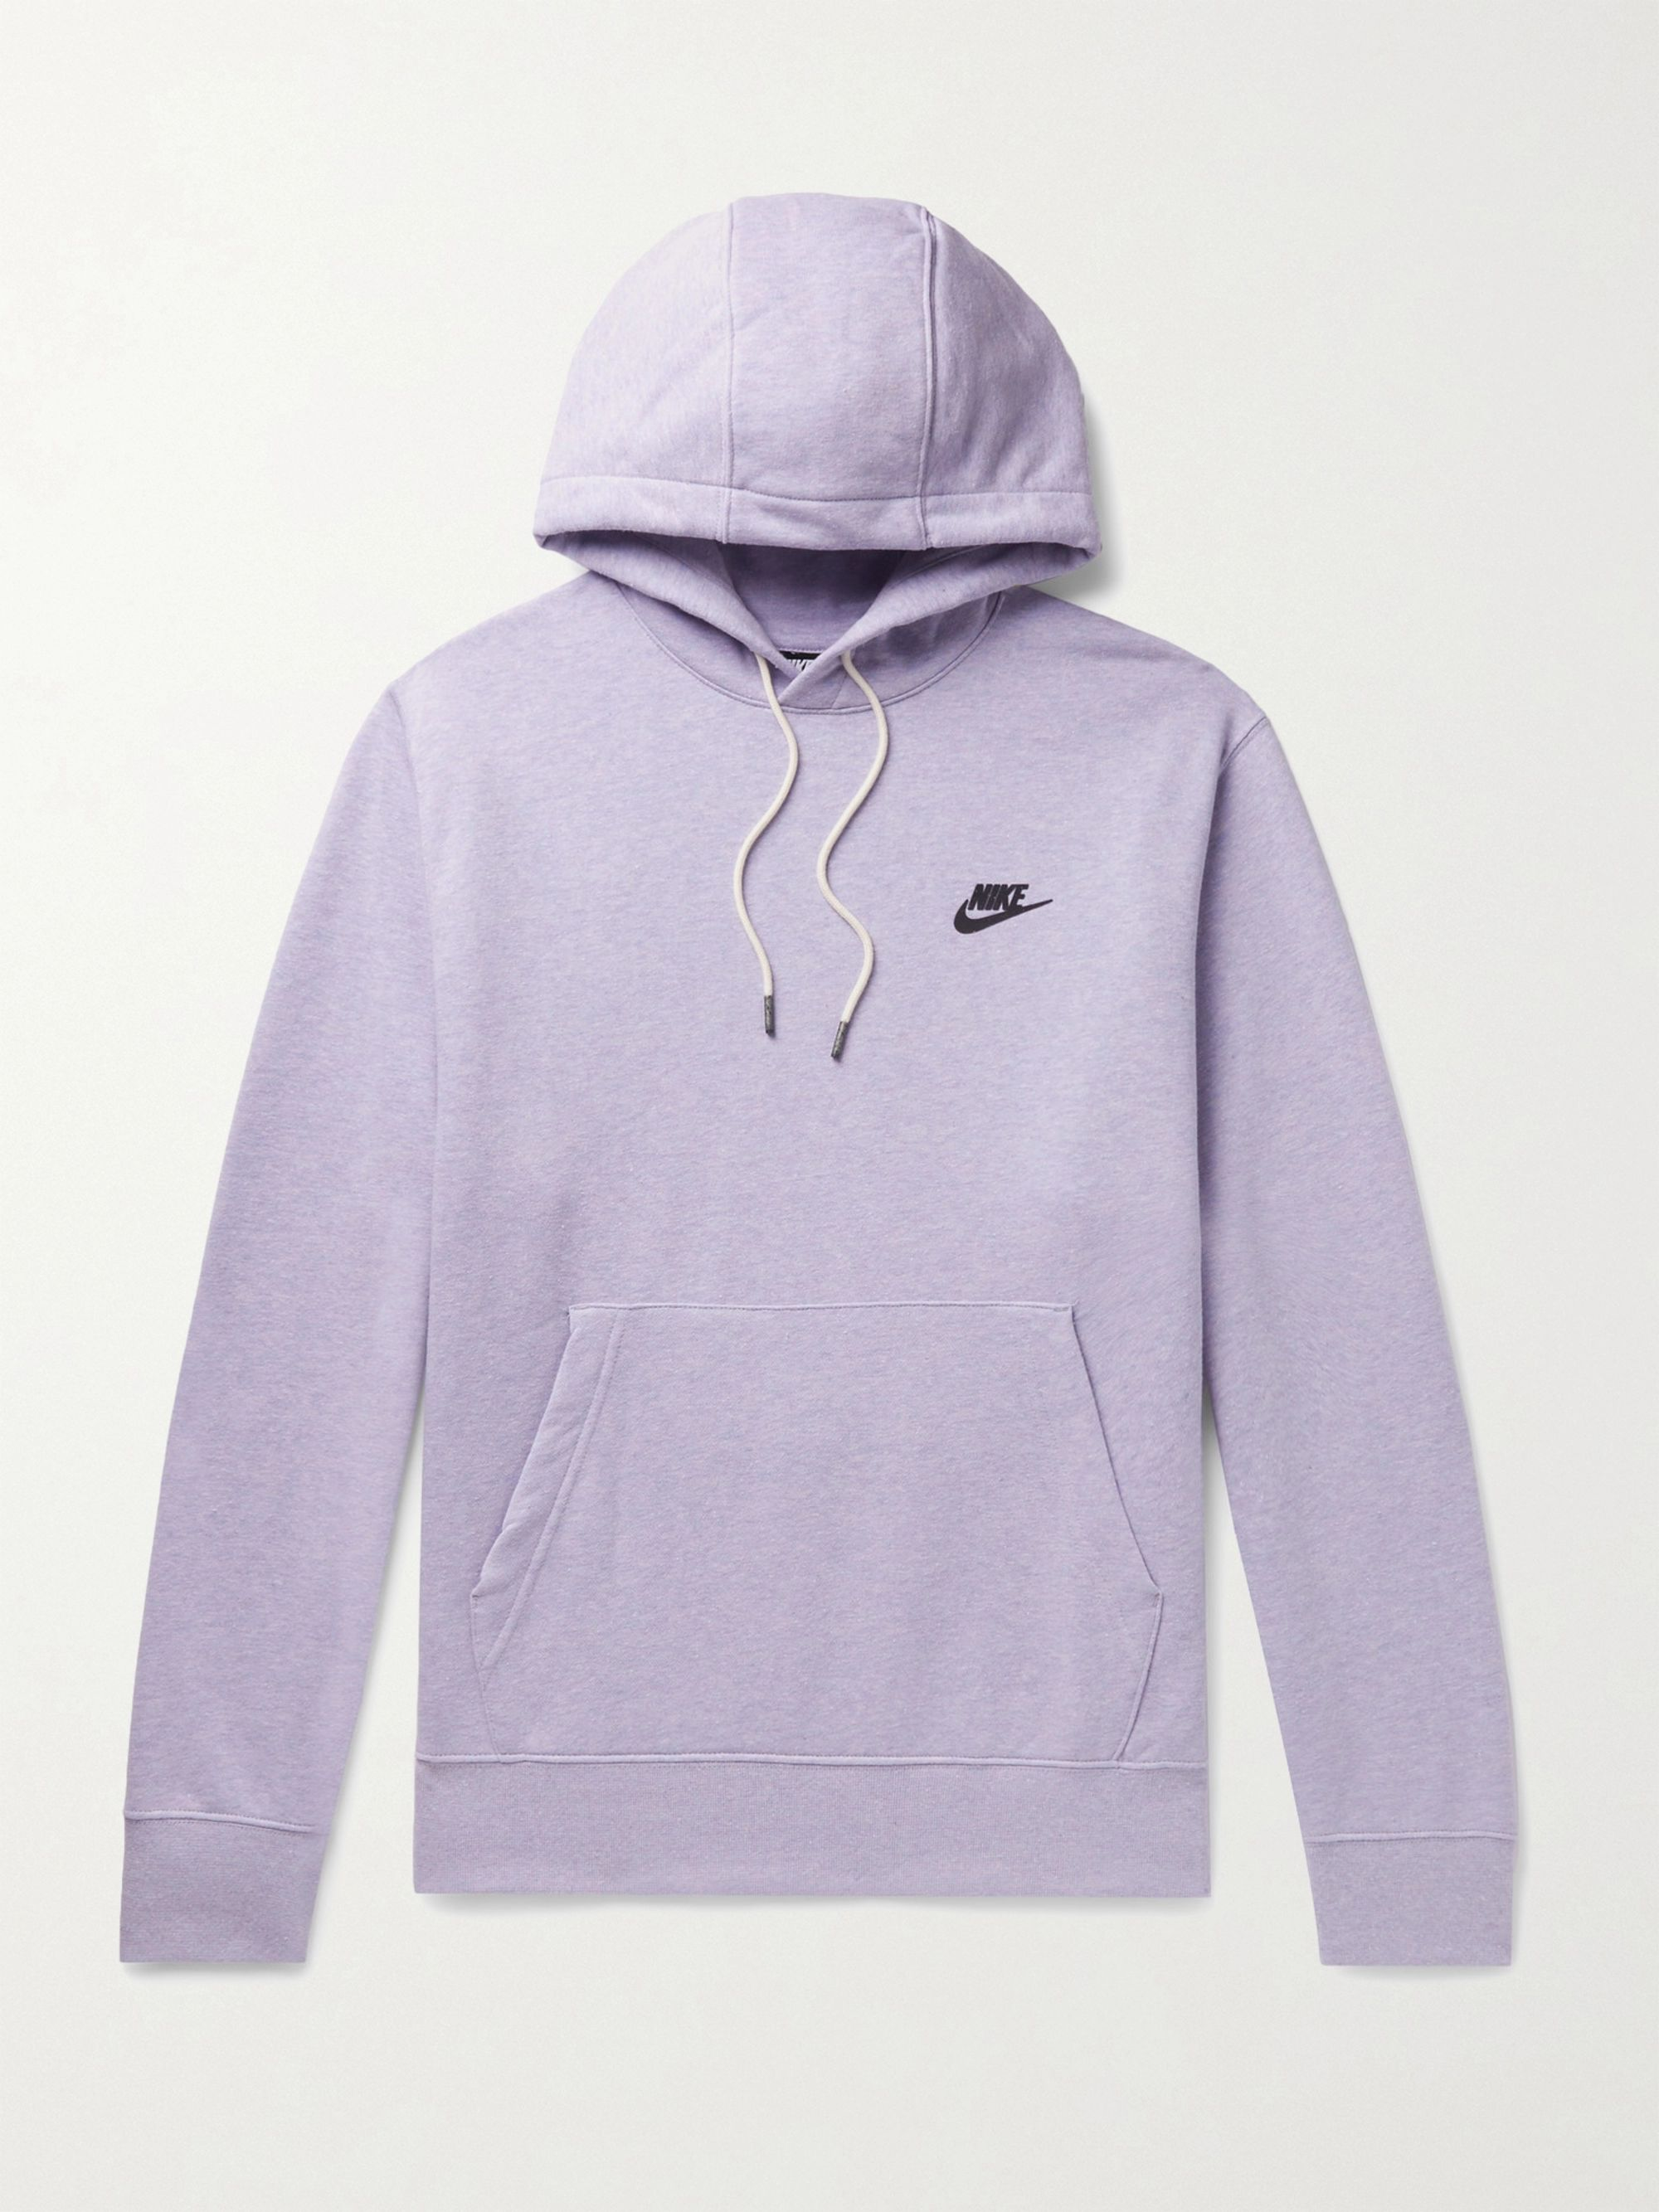 NIKE Logo-Print Cotton-Blend Jersey Hoodie